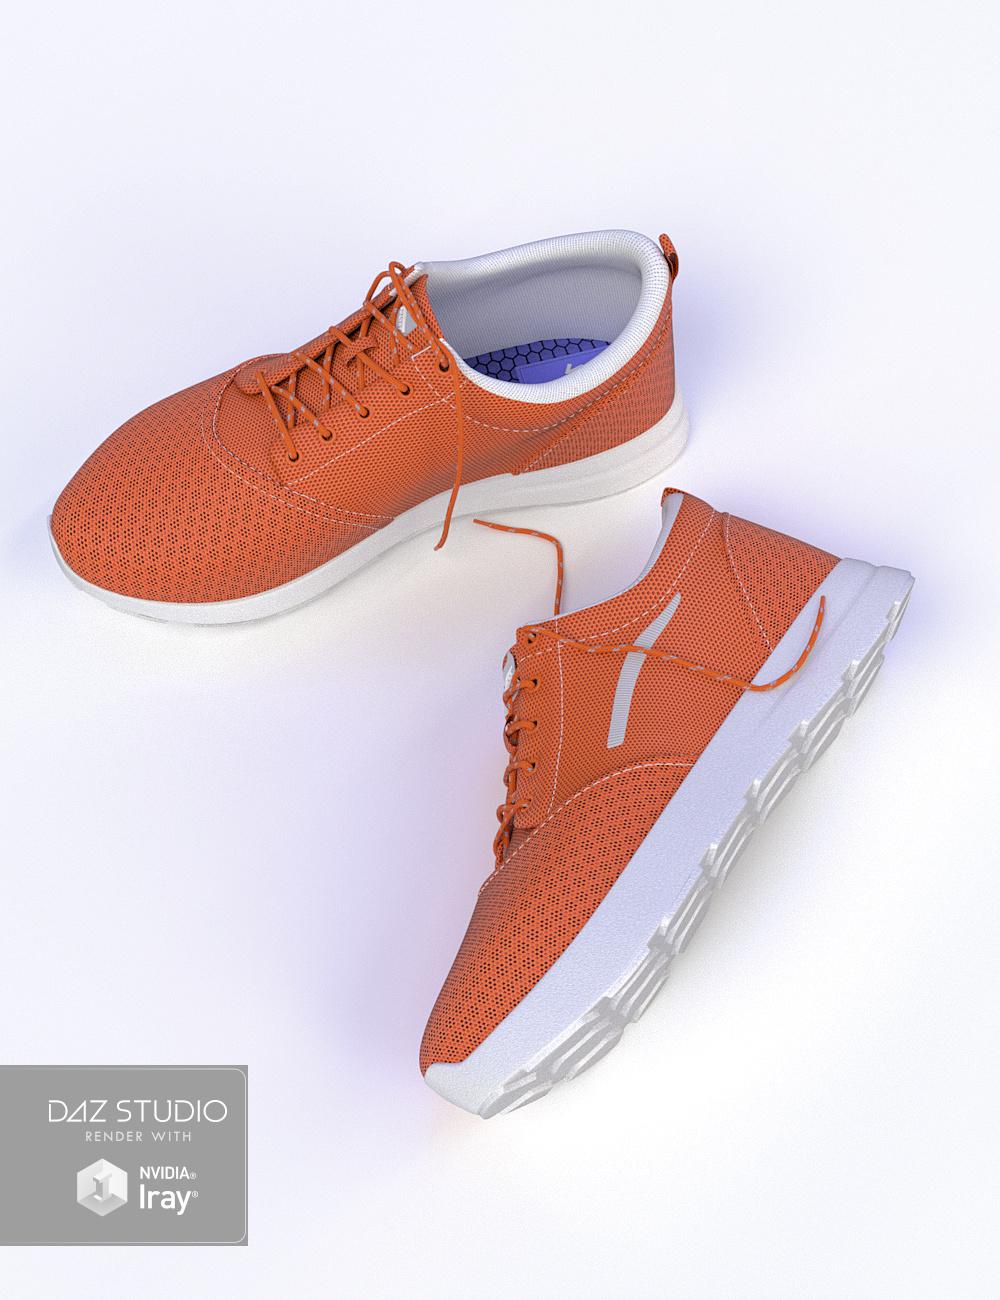 TreadZ Athletic Collection by: Daz Originalsthe3dwizard, 3D Models by Daz 3D